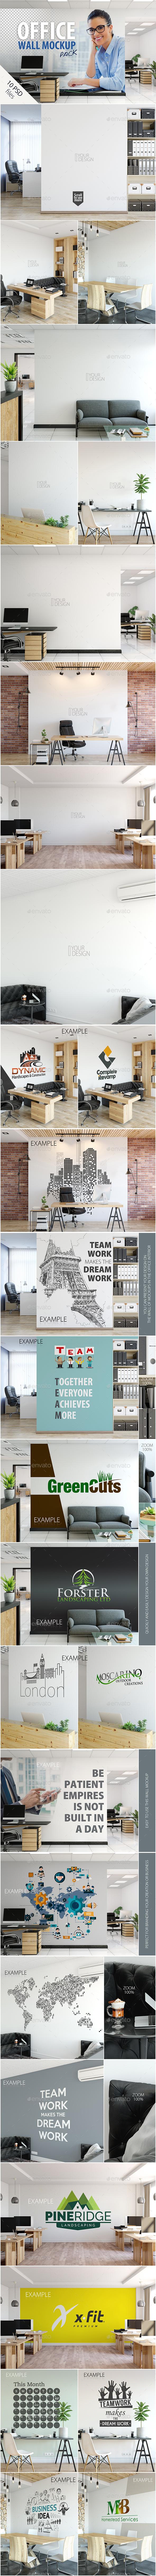 Office Wall Mockup Pack - Product Mock-Ups Graphics